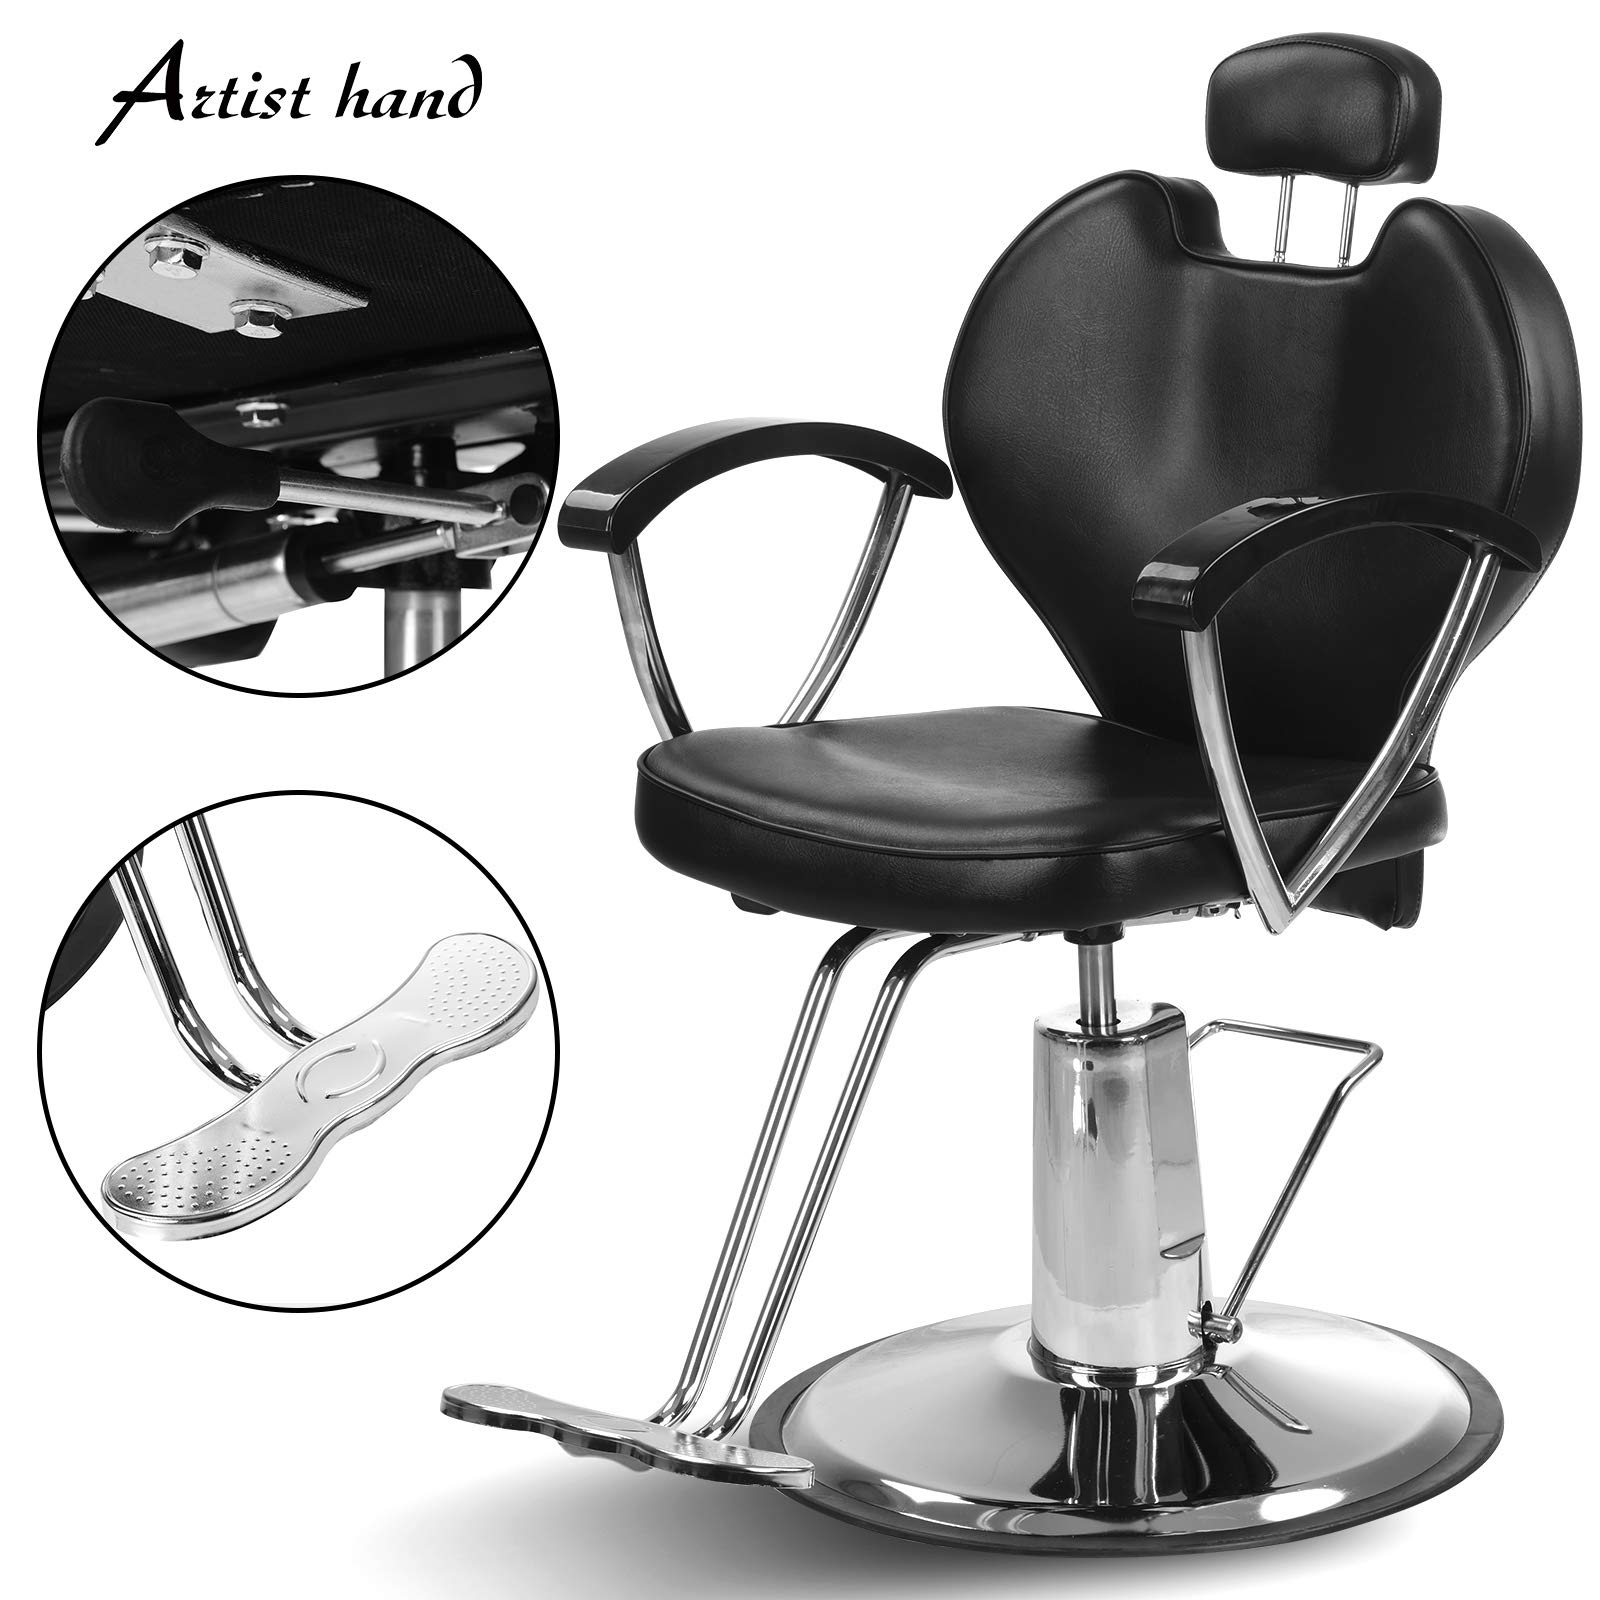 Artist Hand Hydraulic Reclining Barber Chair 20 Inch Width Hair Styling Chair Salon Chair Spa Equipment by Artist Hand